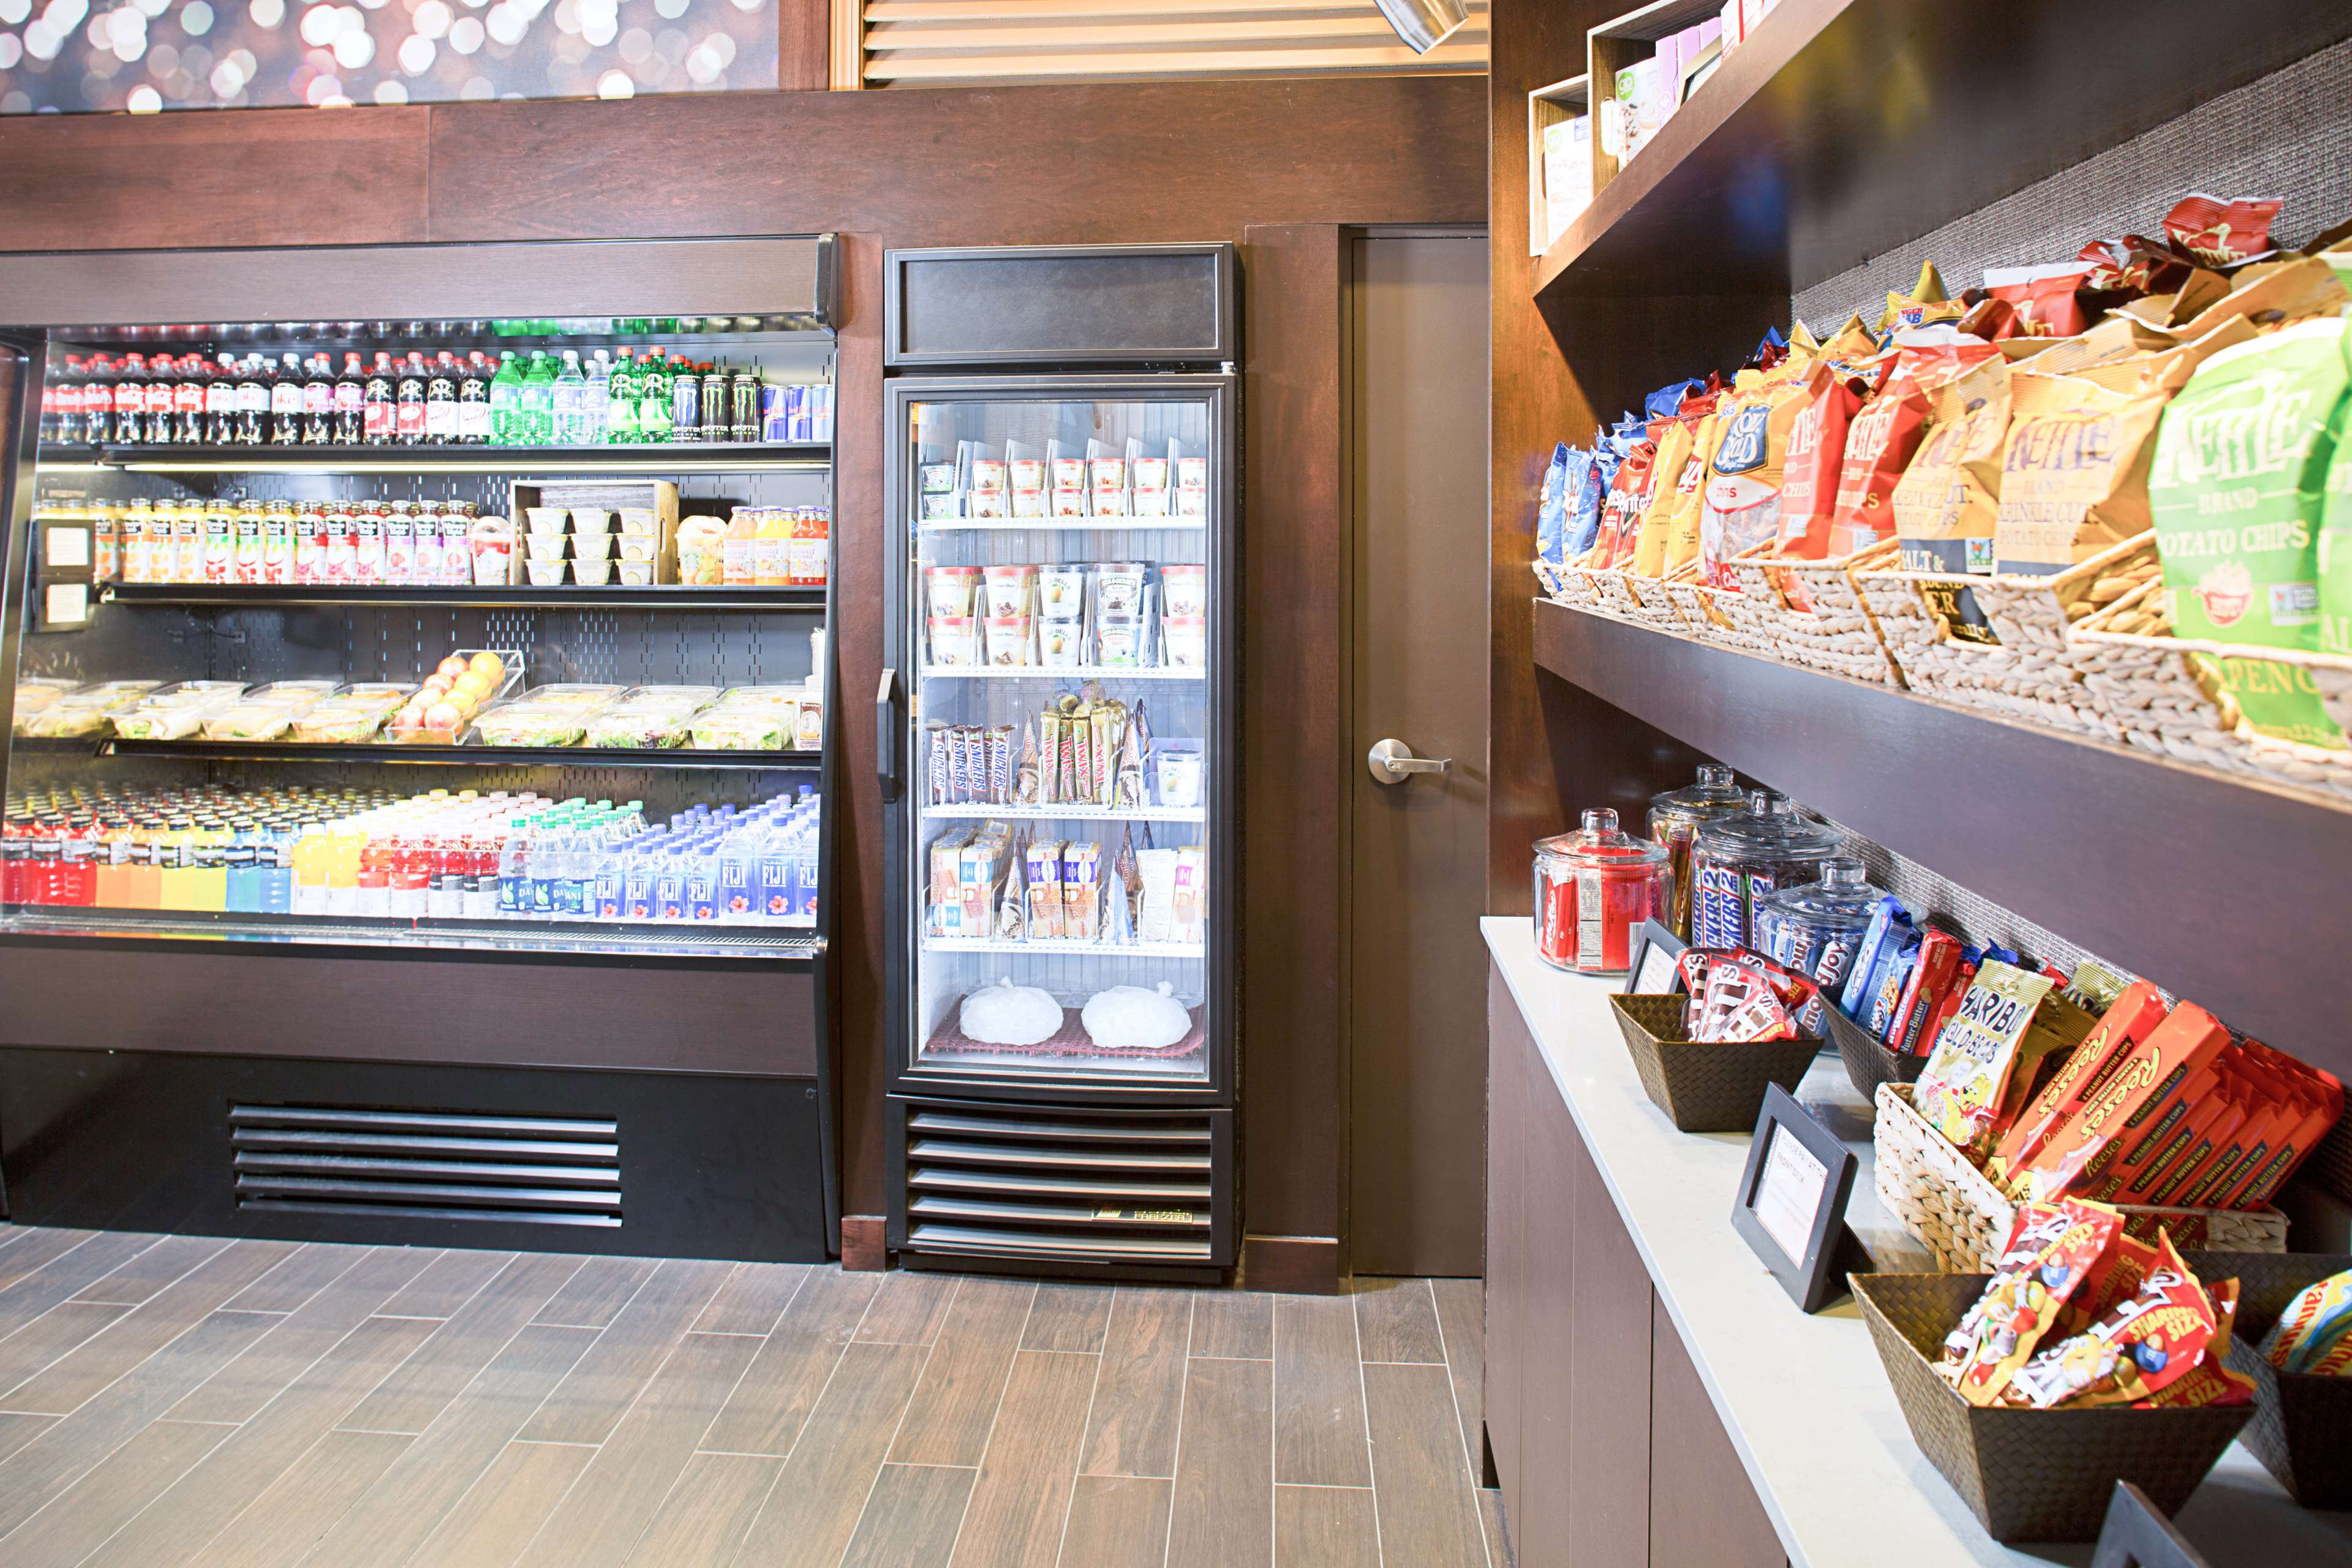 Hilton Boston Back Bay image 28